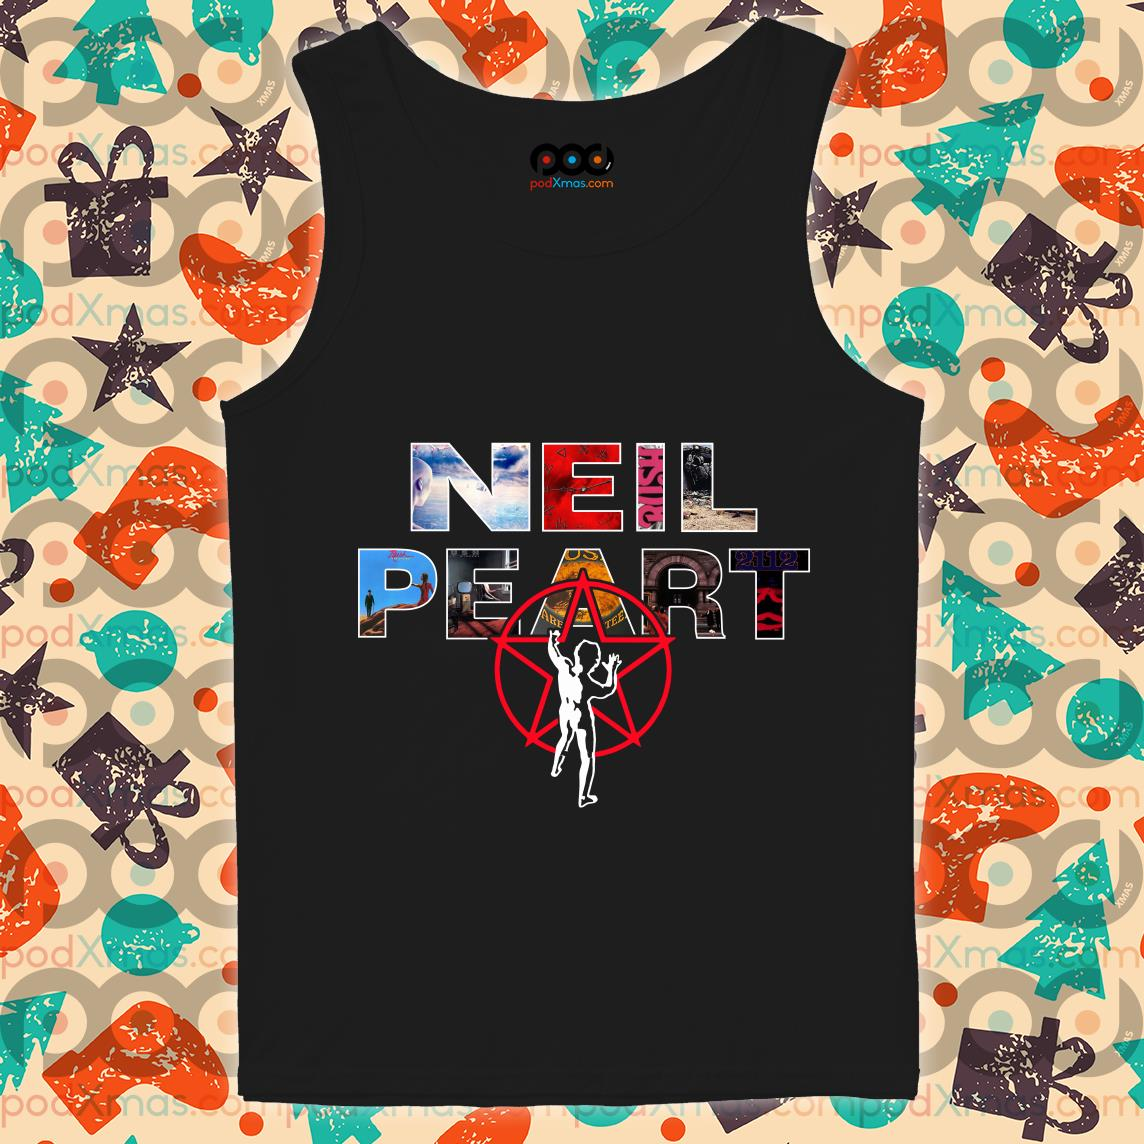 Neil Peart Rush Band logo tank top